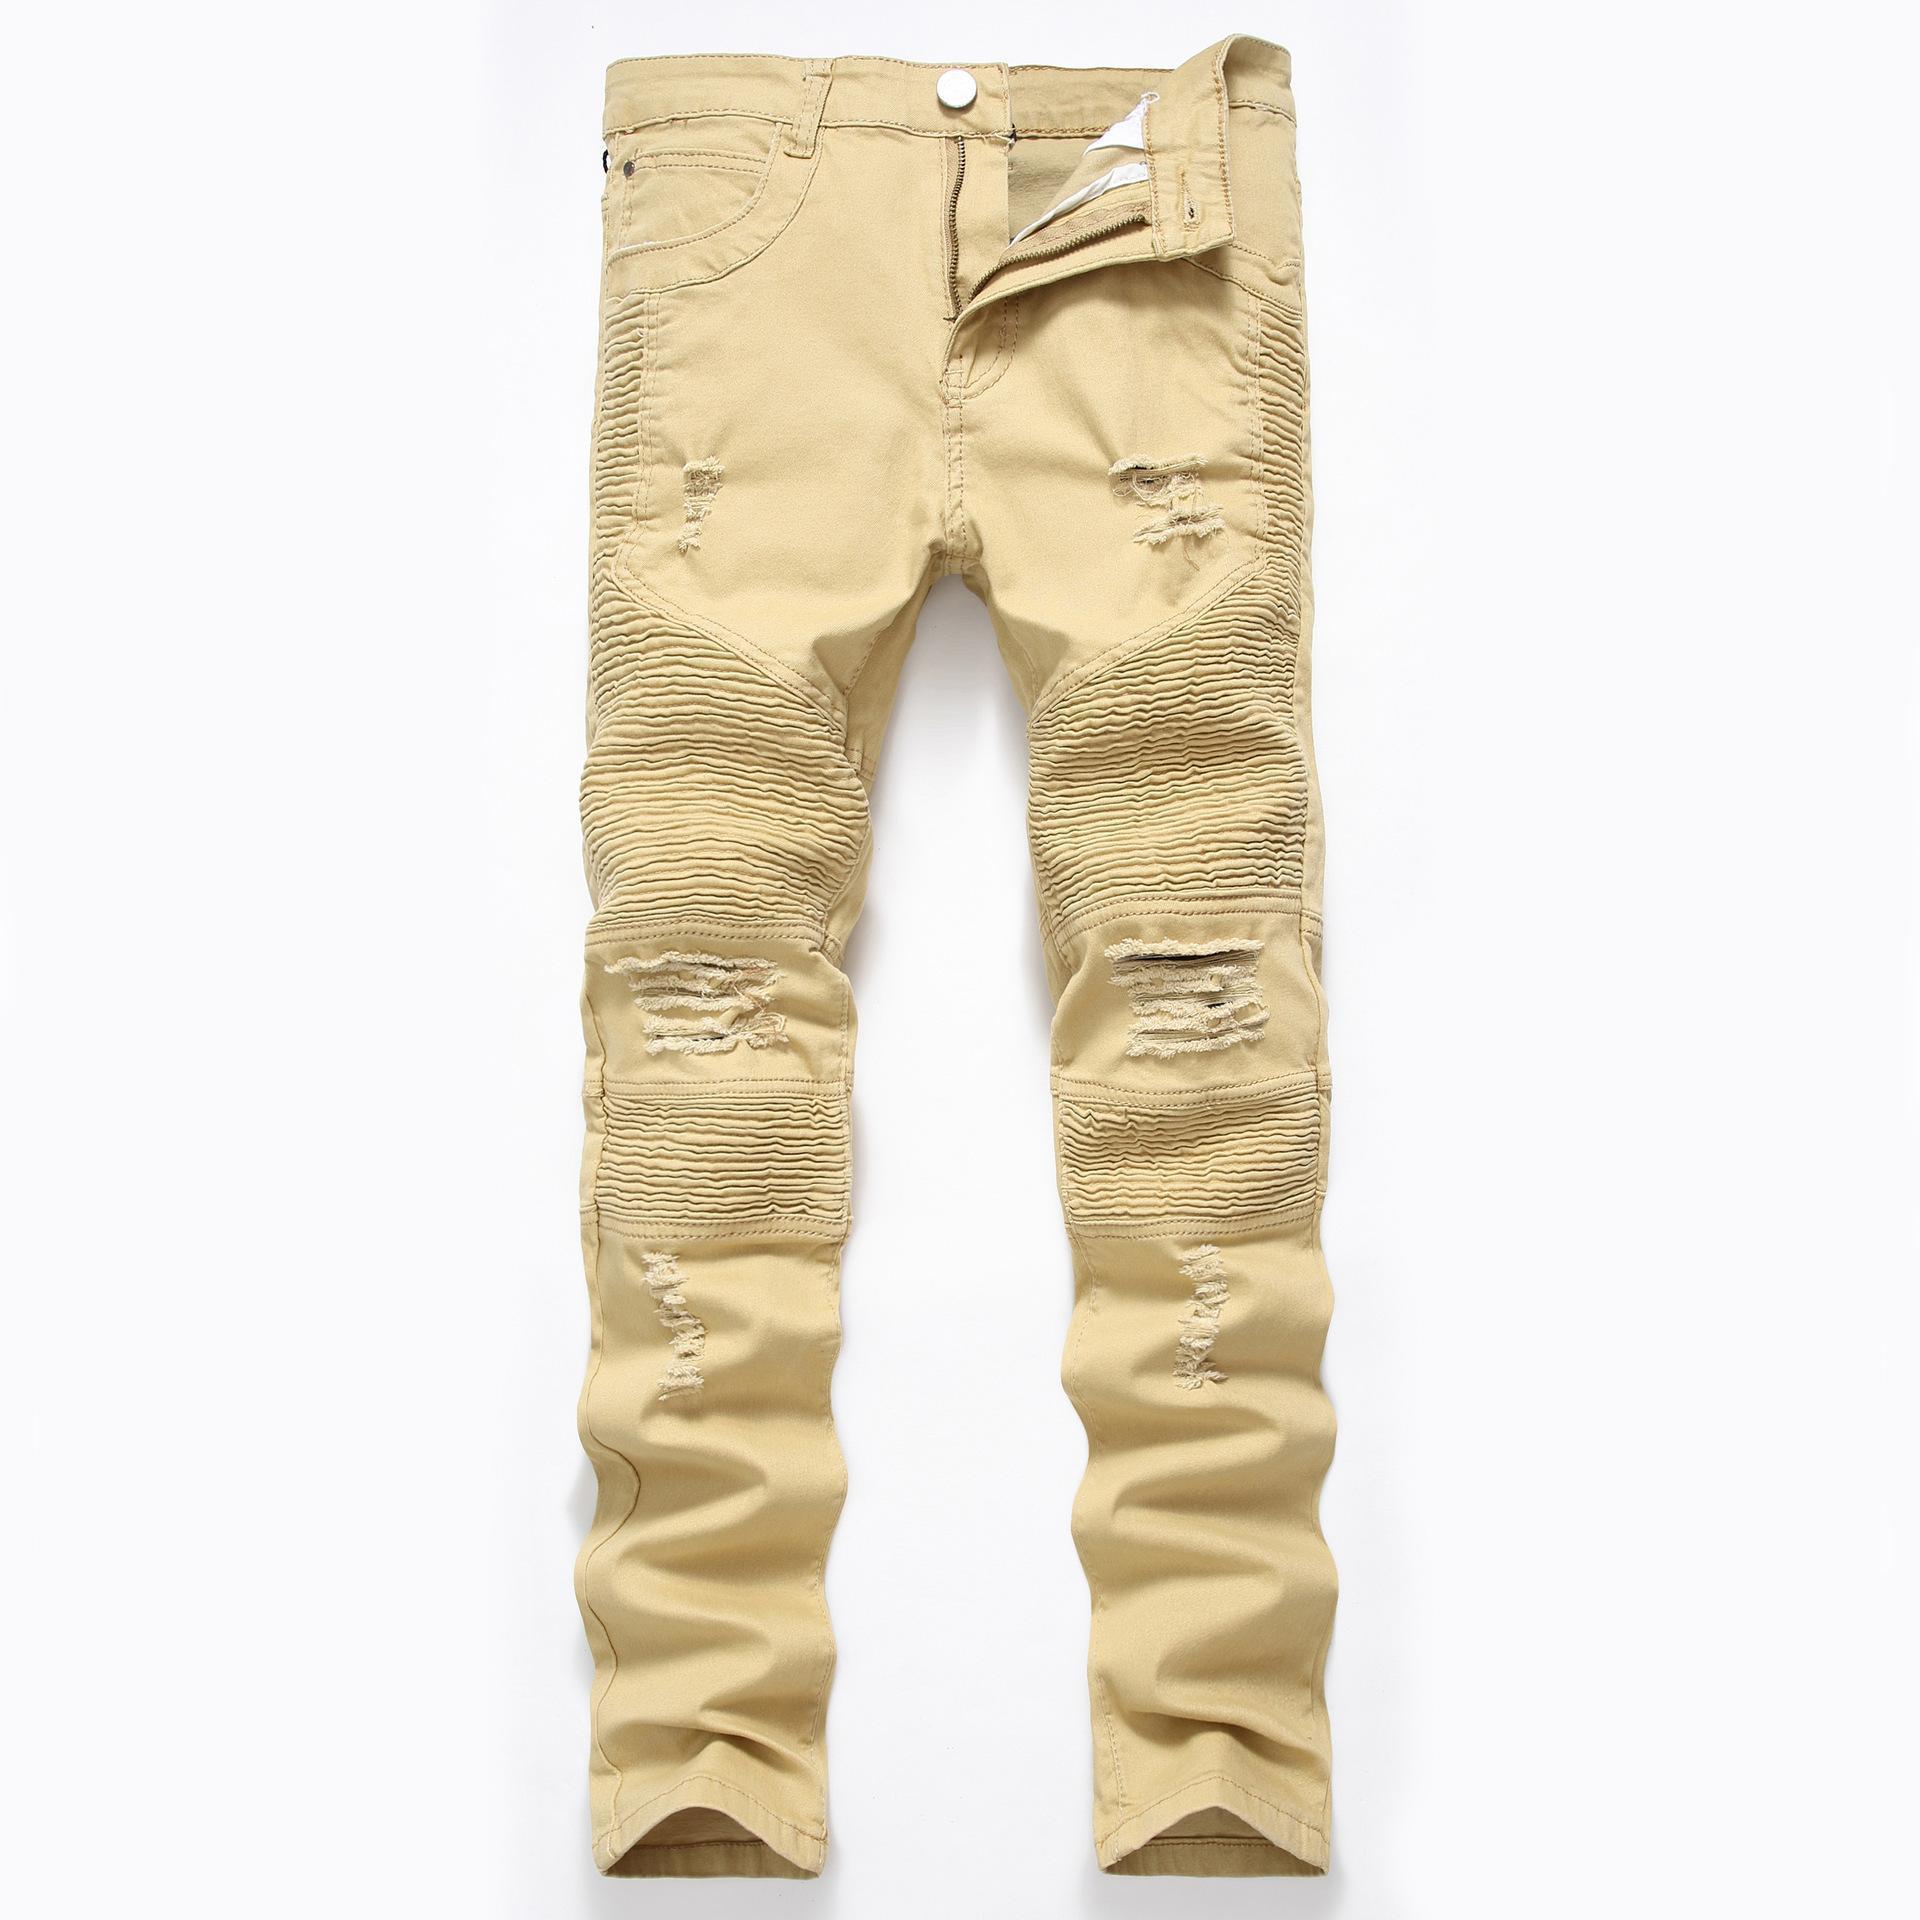 Khaki Biker Jeans Falten Design Herren Dünne dünne dünne Stretch Denim Hosen Neue Ankunft HIP -Hop Street Ripping Jeans